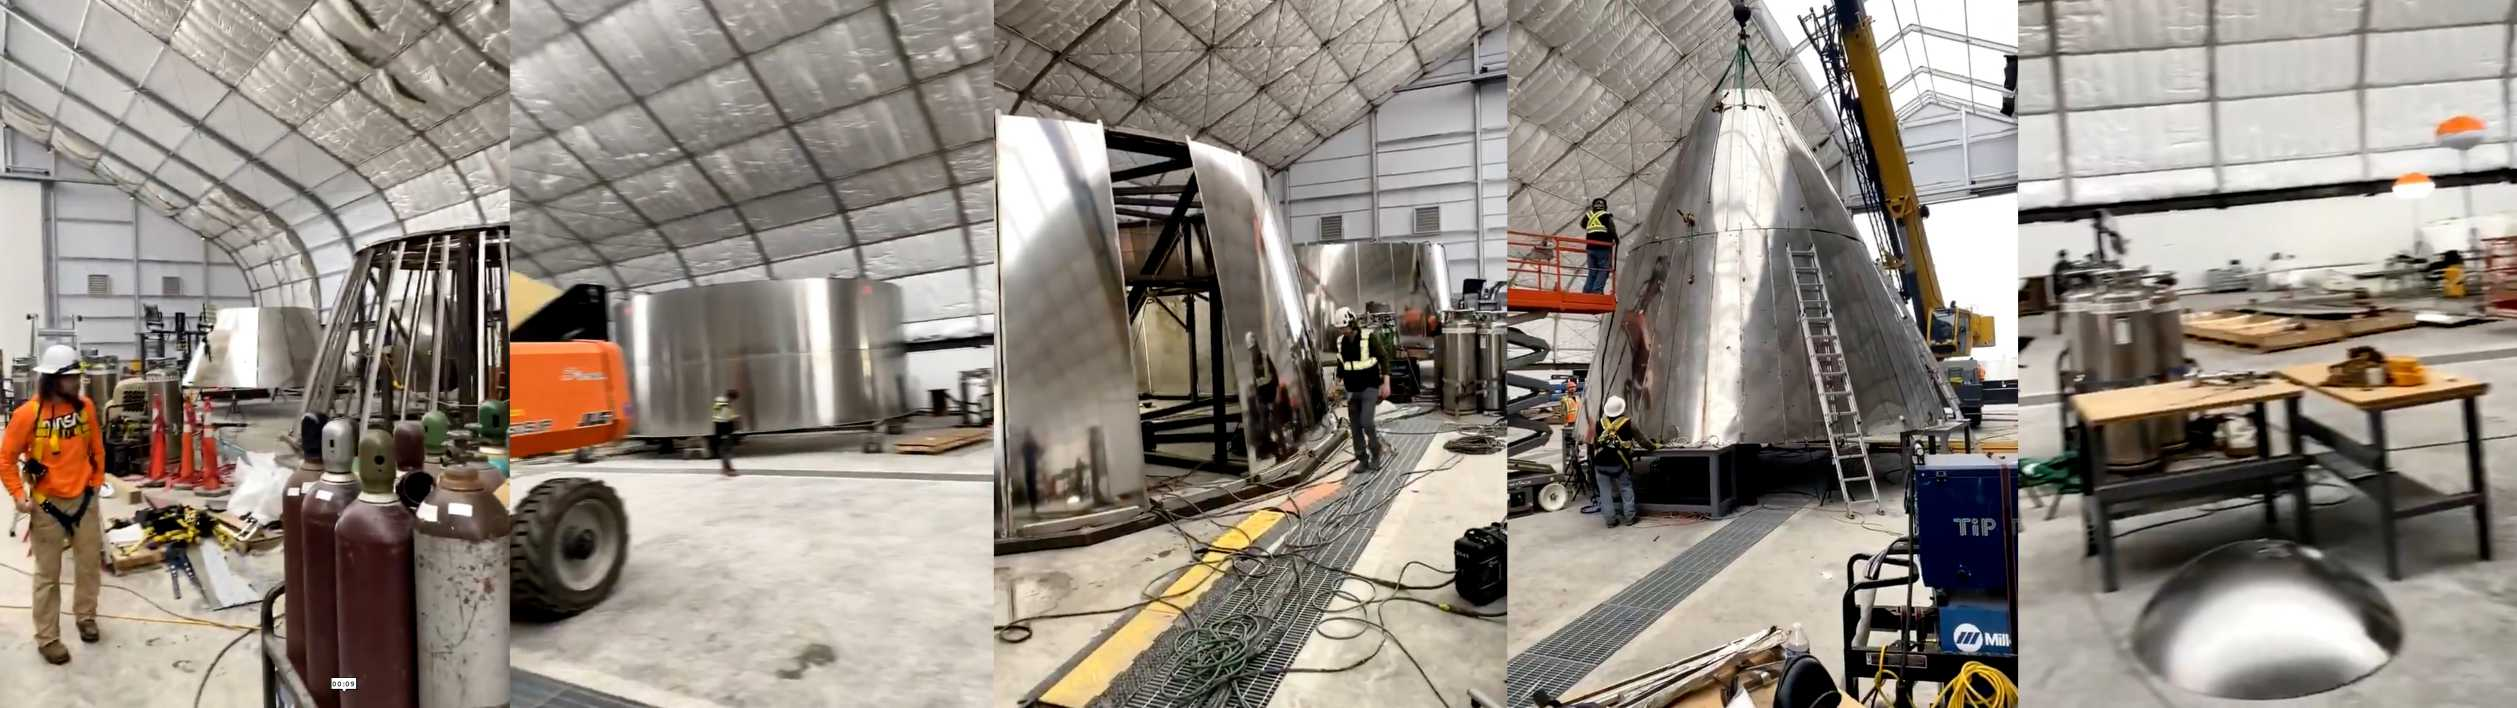 Starship nosecone production tent 021920 (Elon Musk) SN01 mosaic 3 (c)